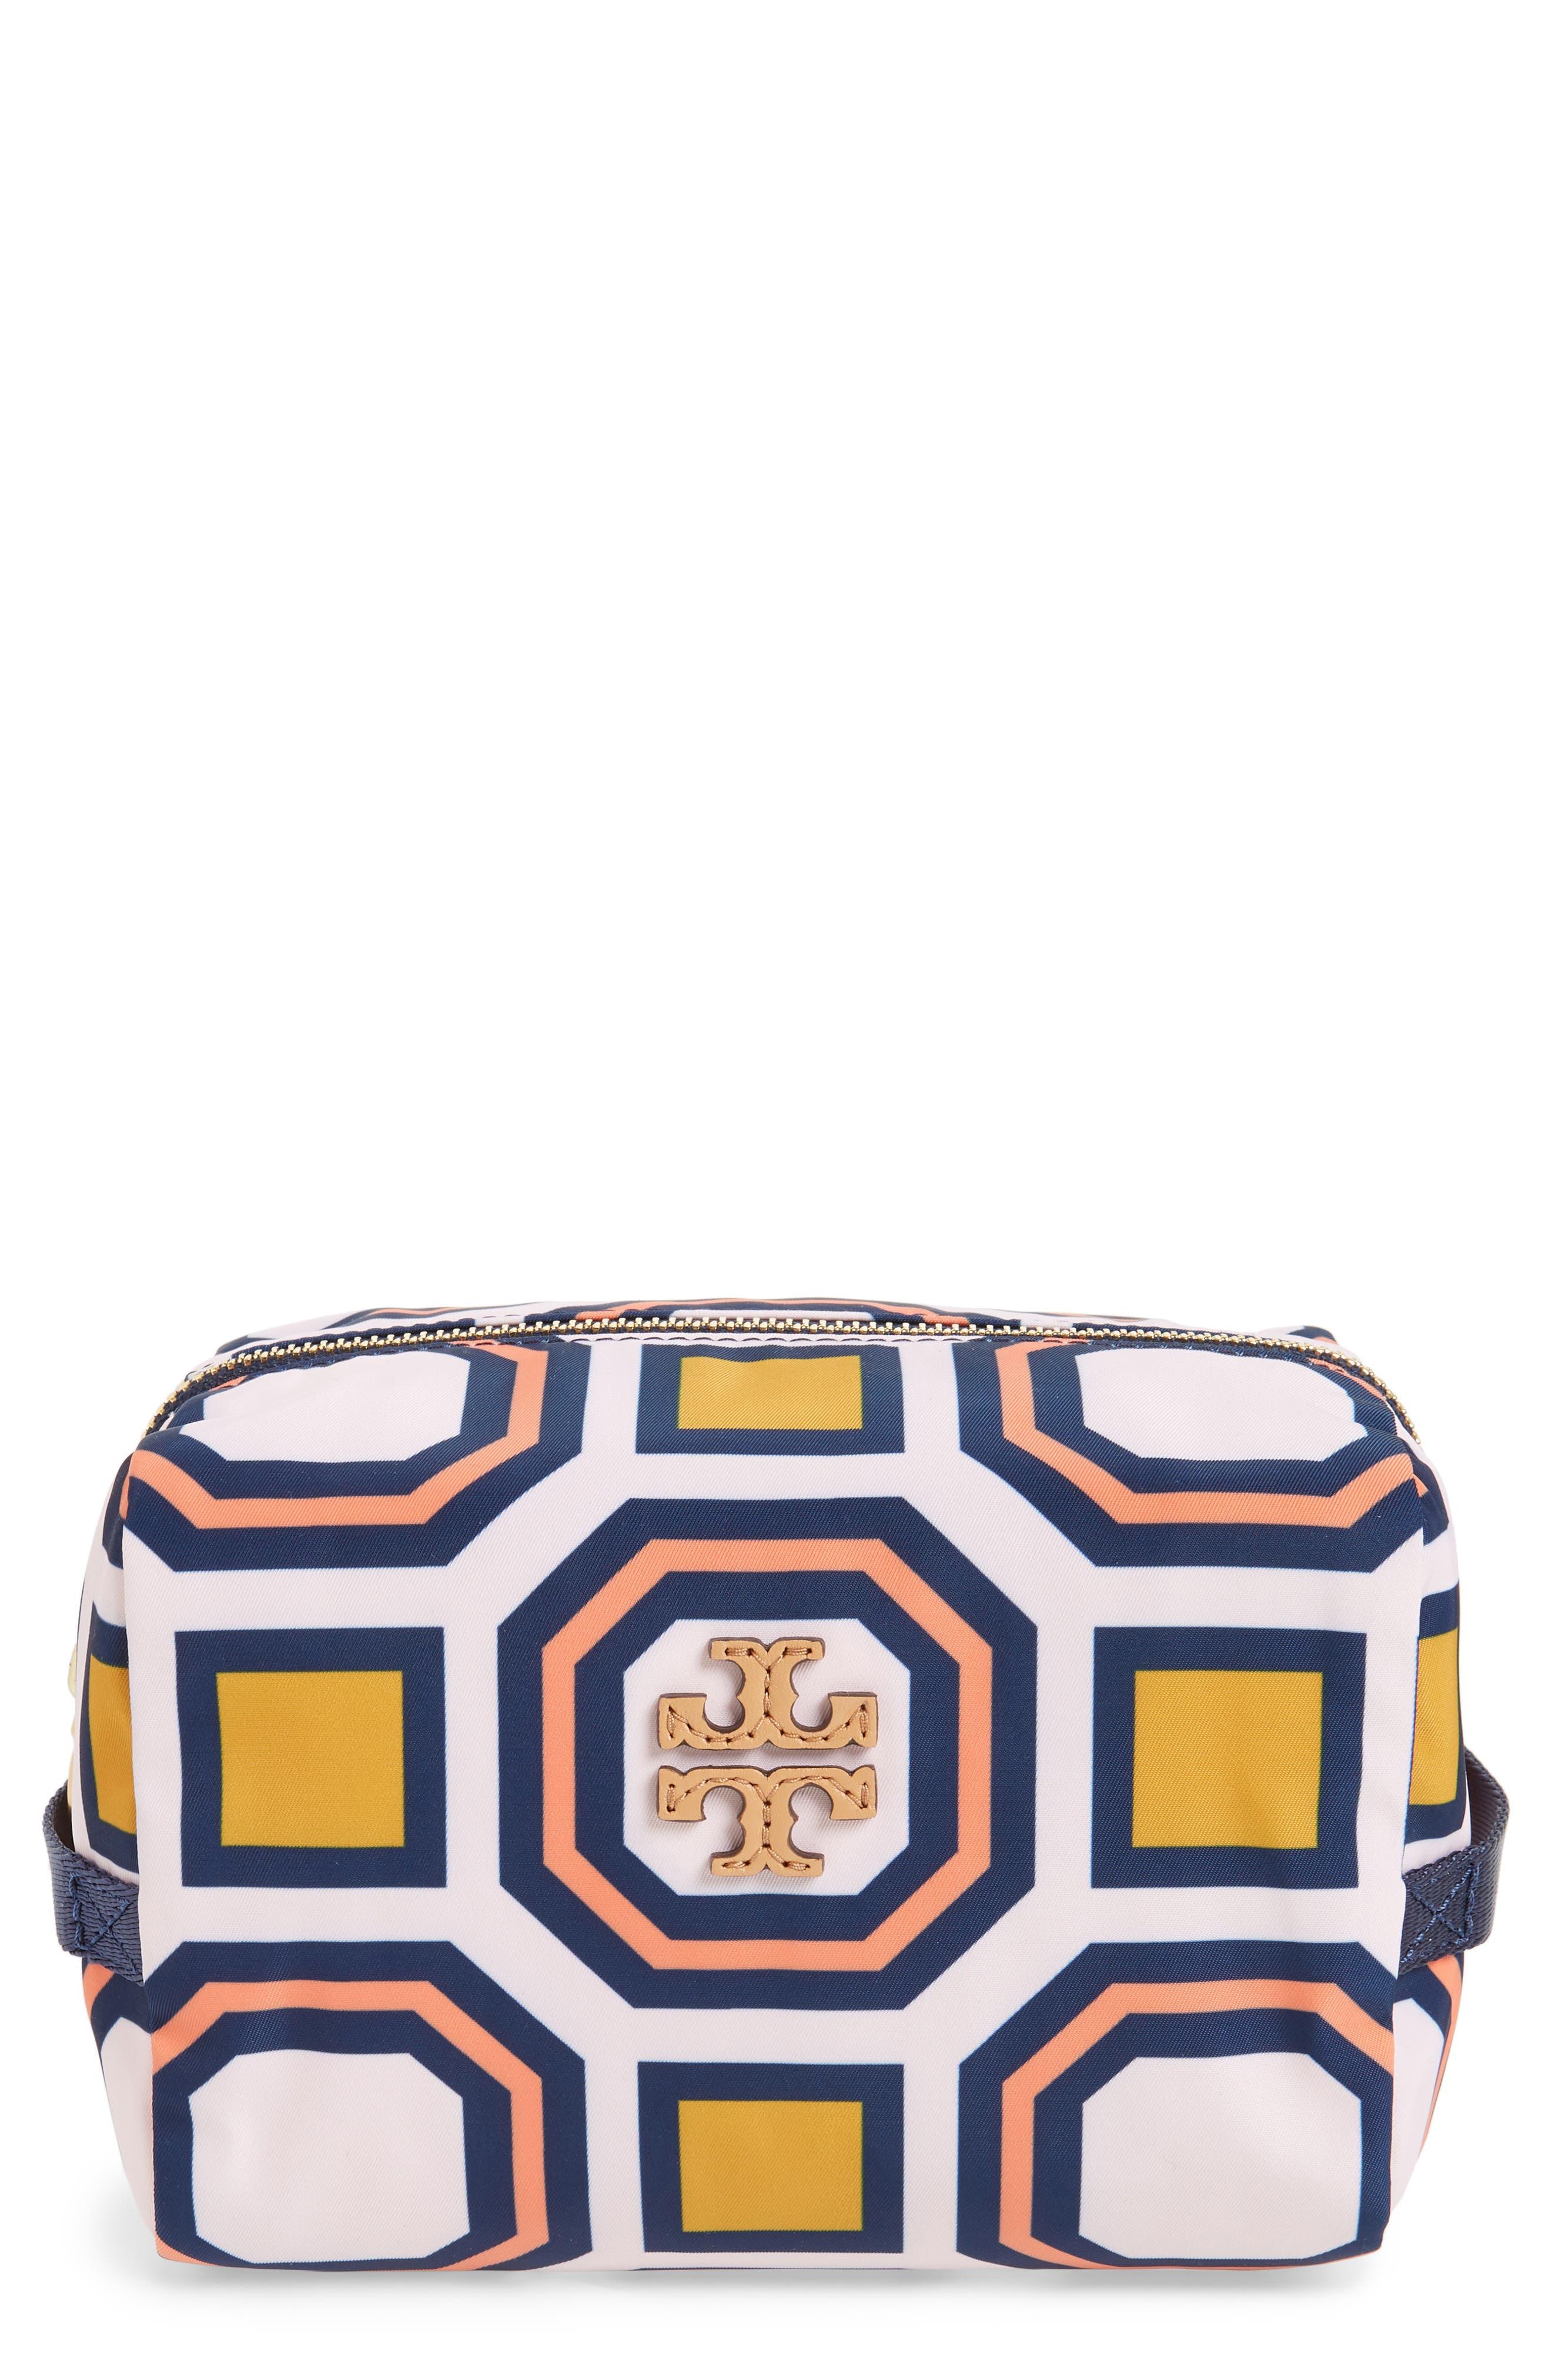 Octagon Print Medium Cosmetics Bag,                             Main thumbnail 1, color,